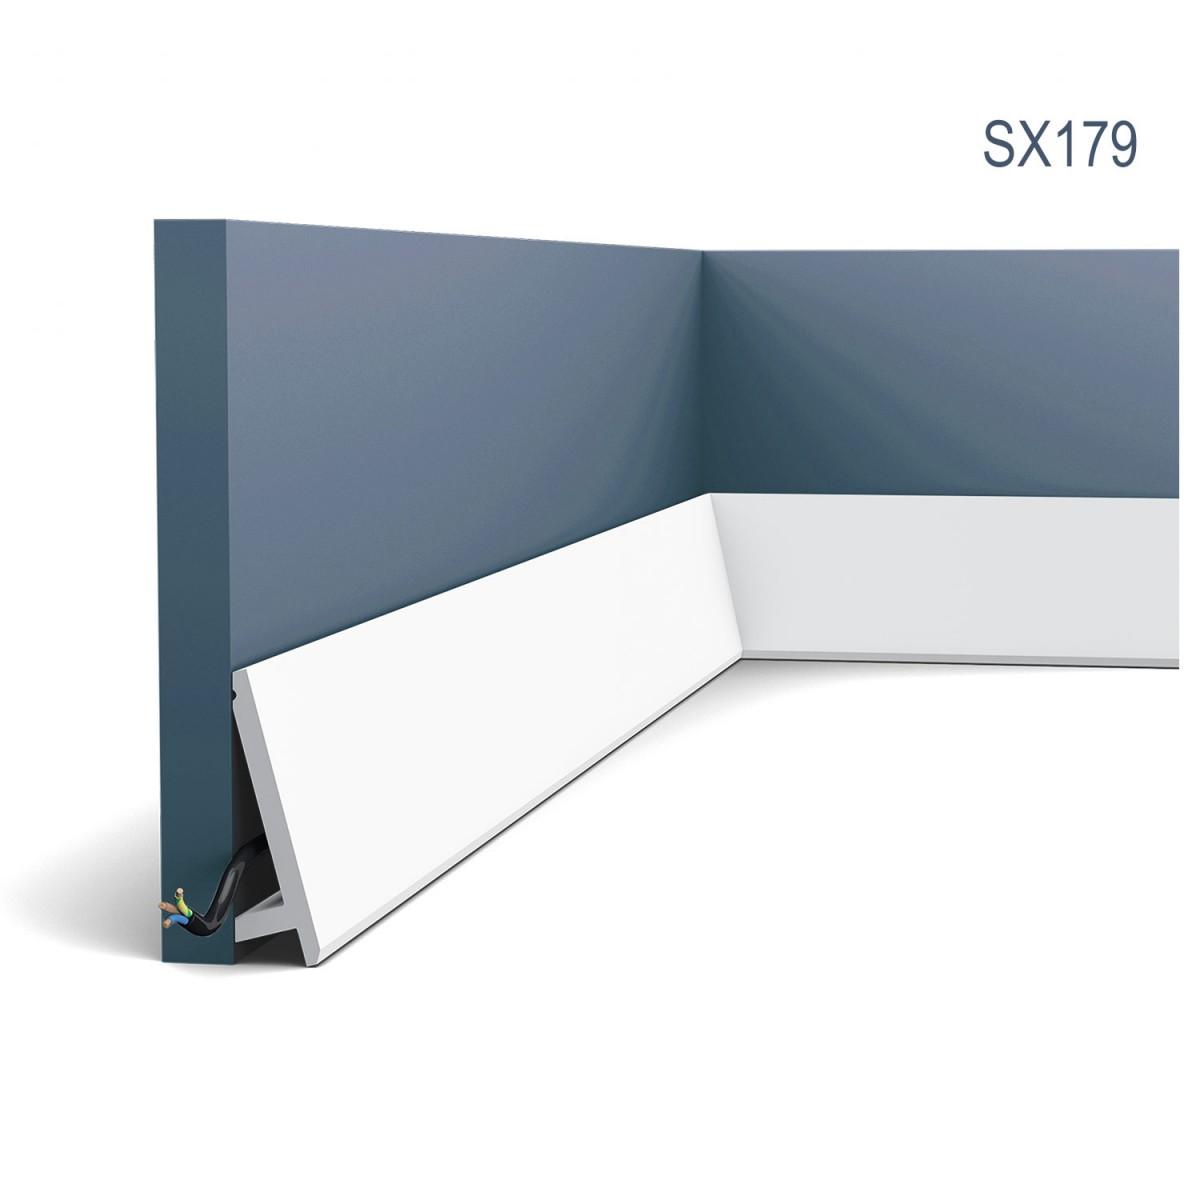 Plintă Modern SX179, Dimensiuni: 200 X 9.7 X 2.9 cm, Orac Decor